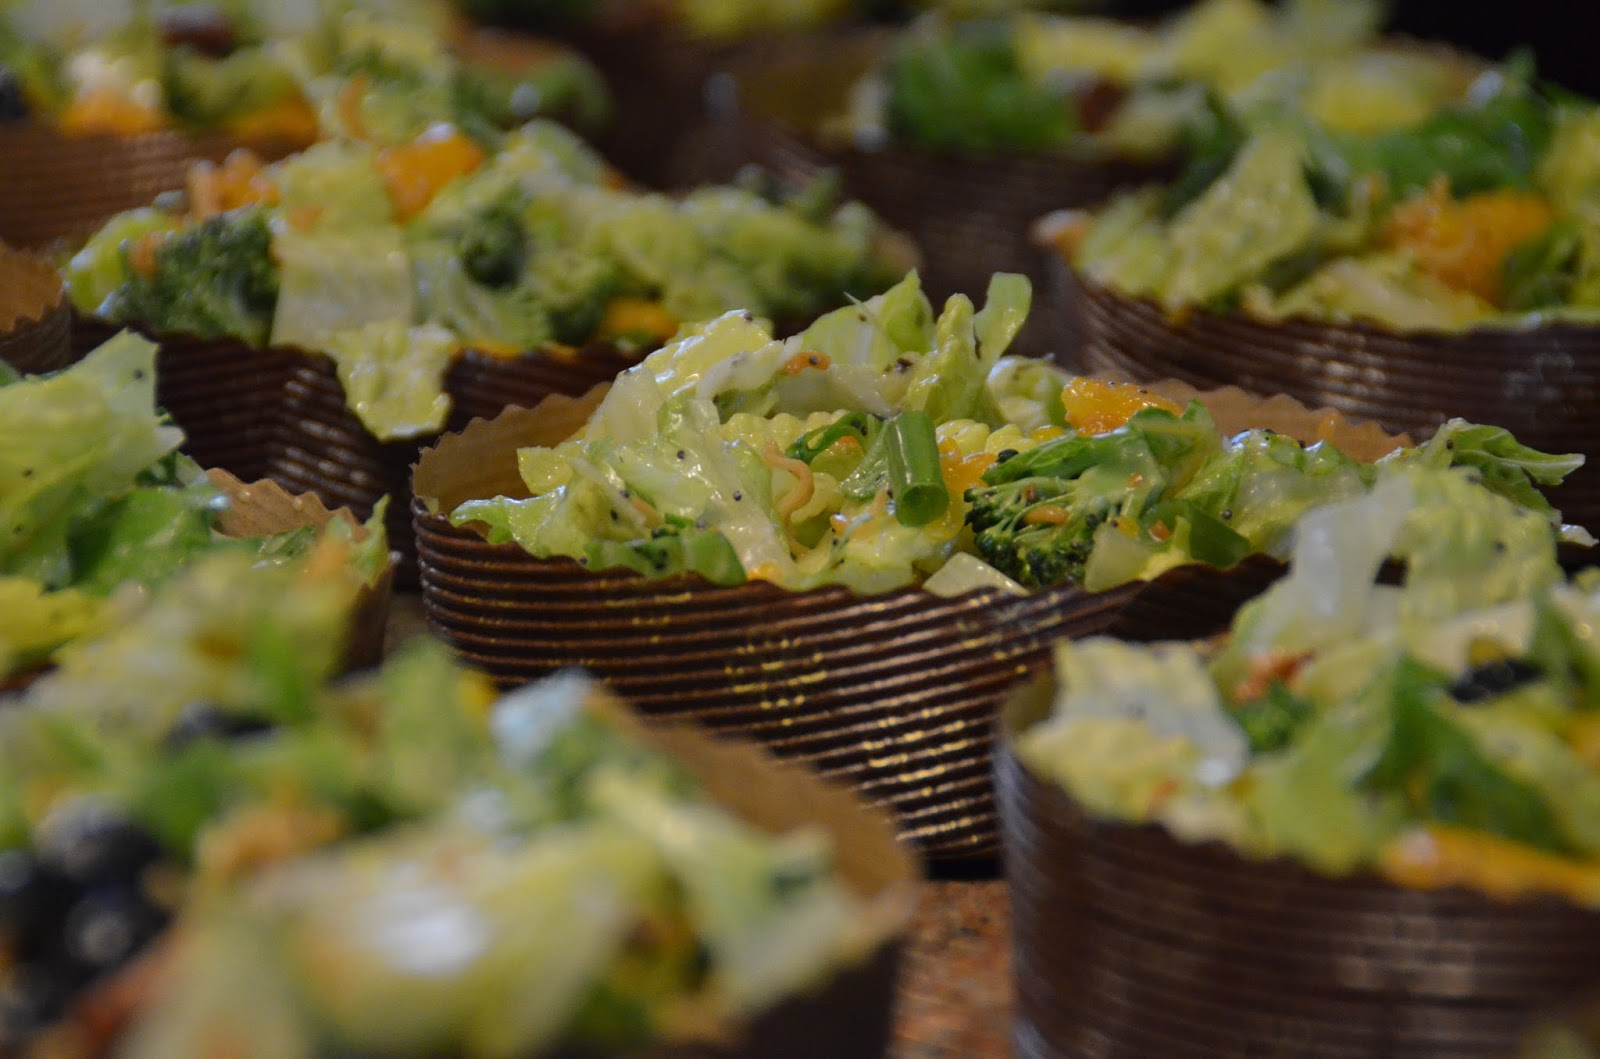 Crunchy Summer Salad with Orange Poppy Seed Dressing